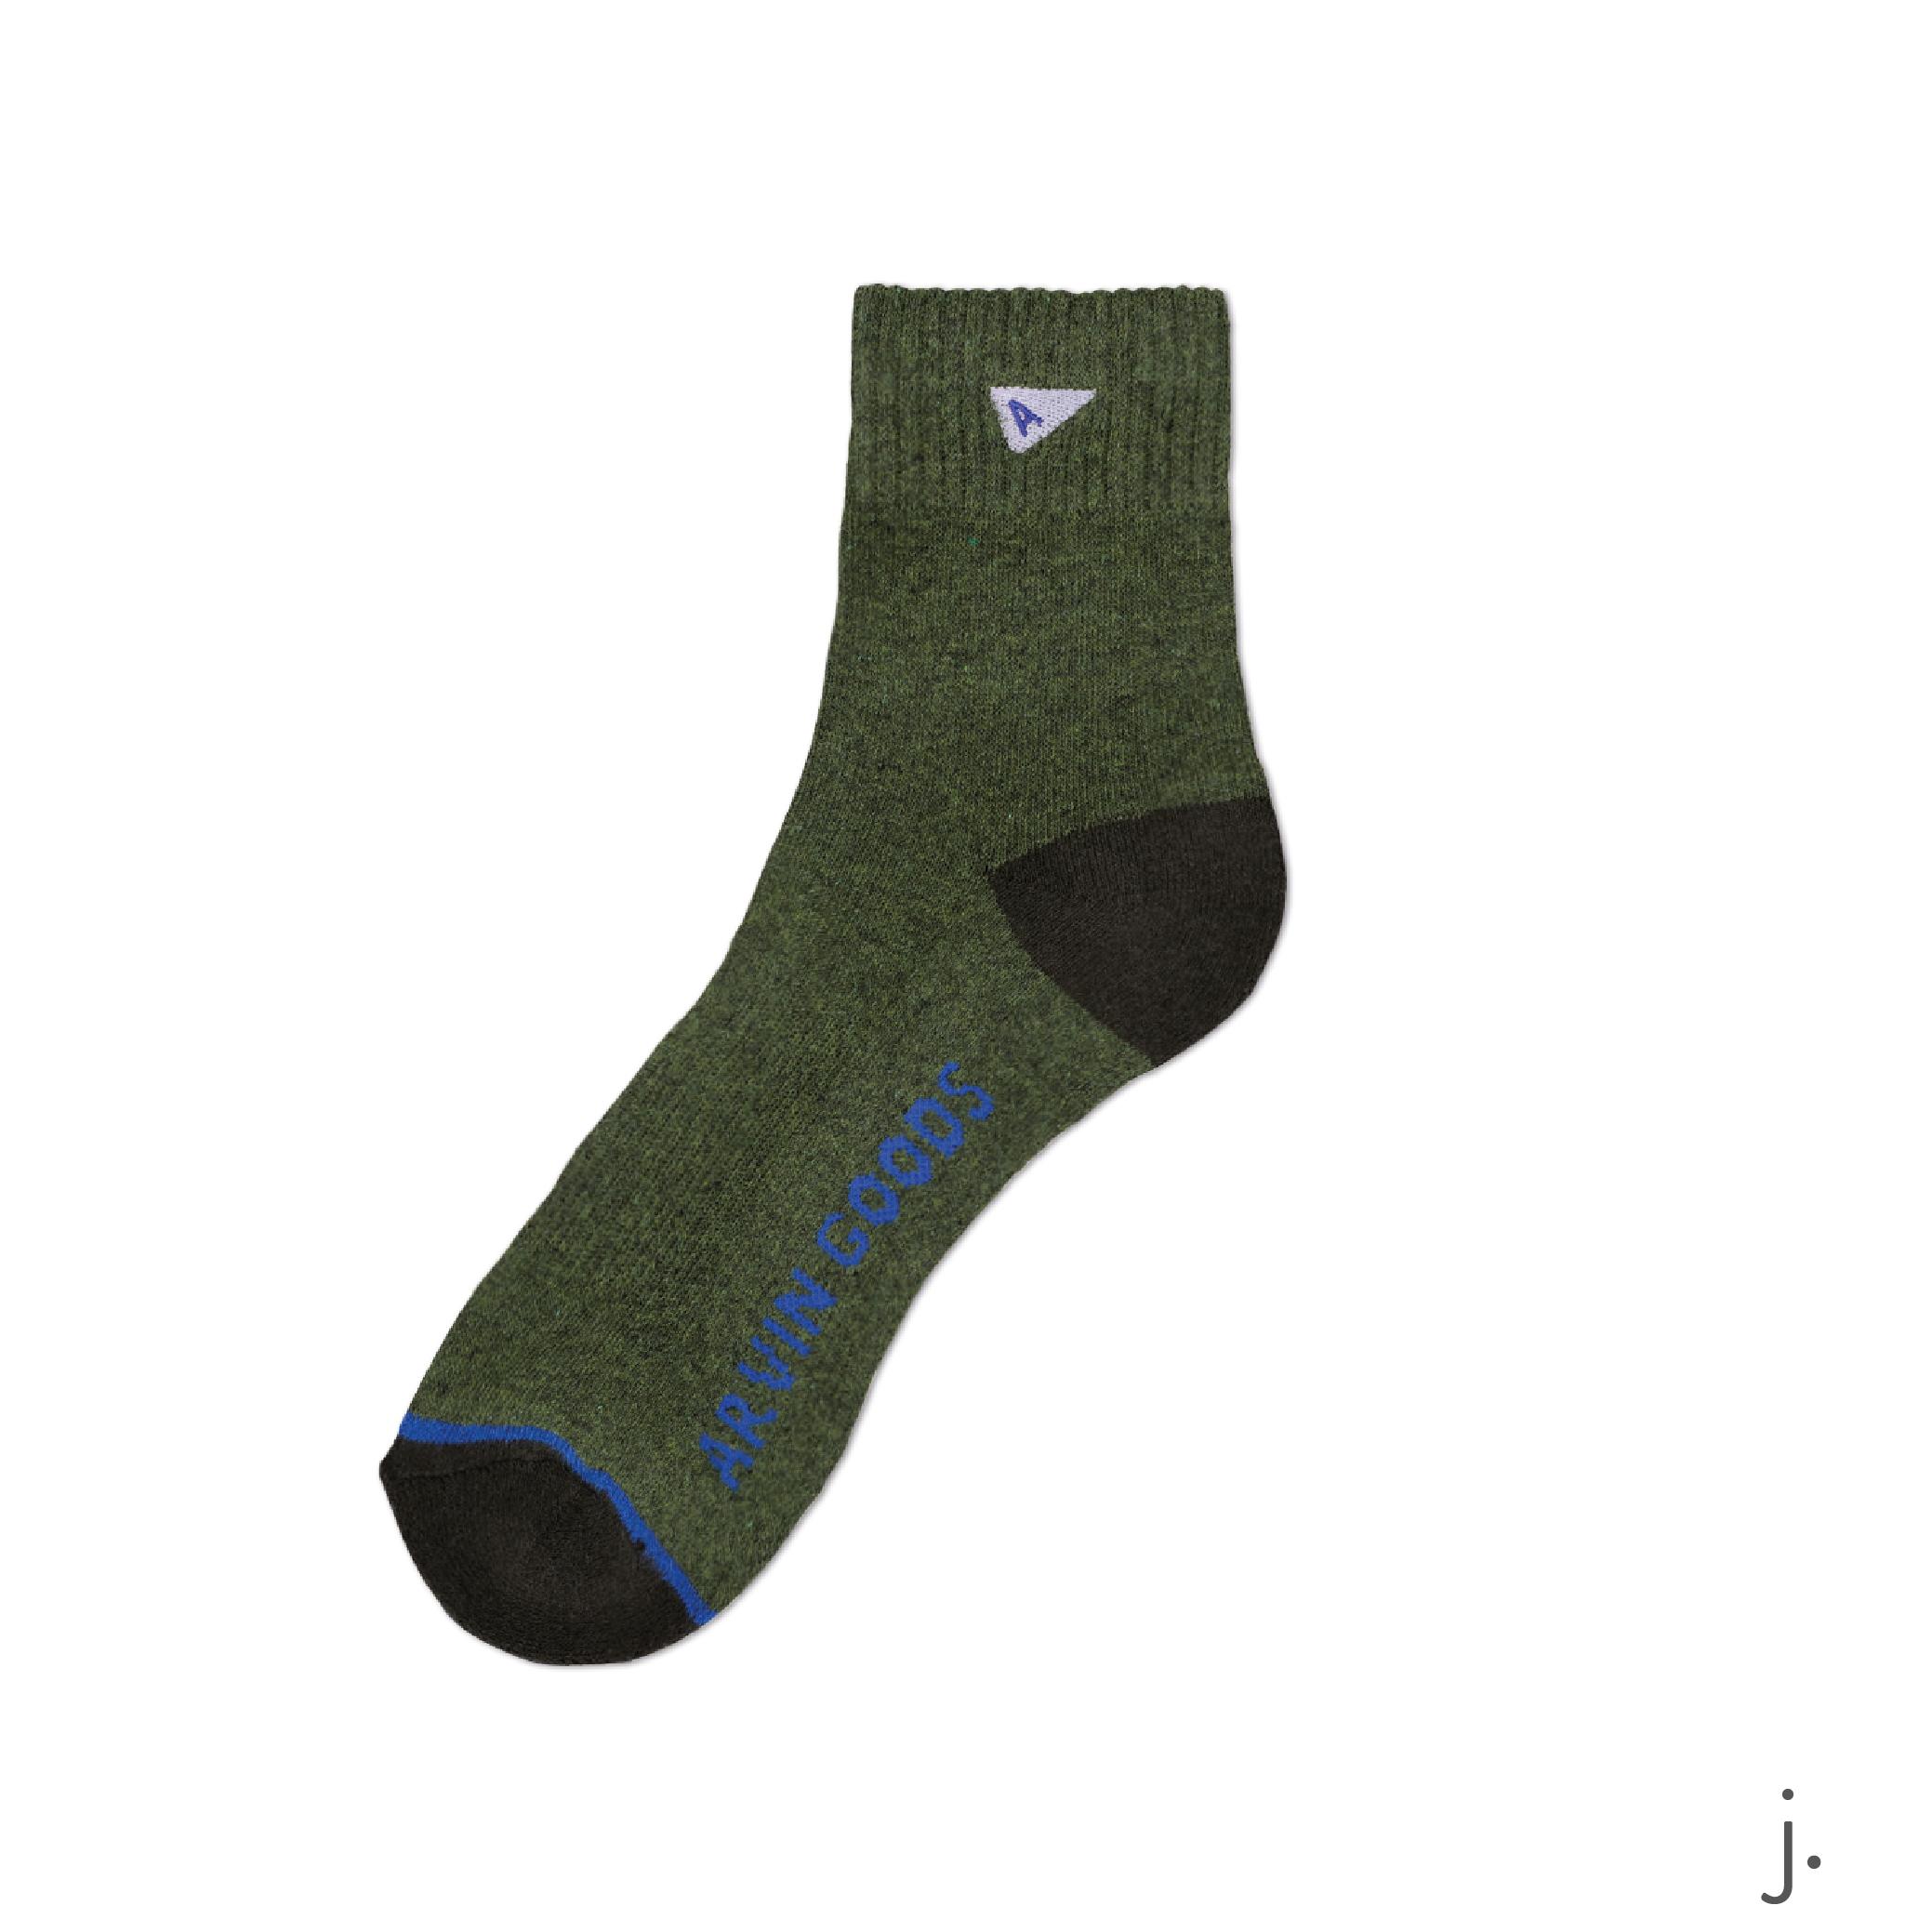 j. Dark Green & Green Crew Sock-01-01.png